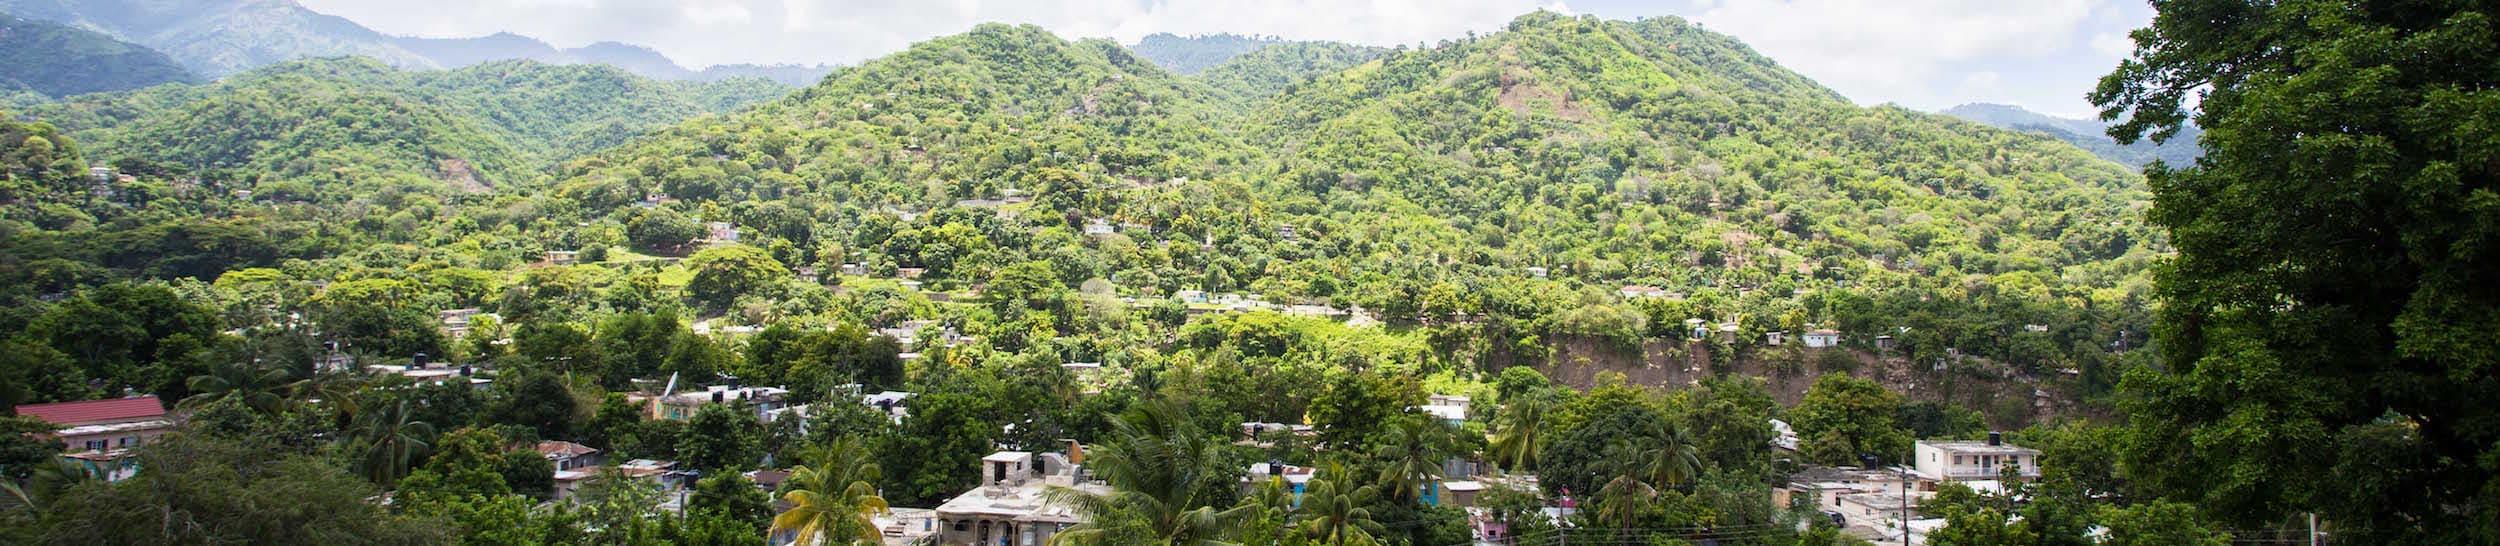 Jobs and salaries in Kingston, Jamaica - Teleport Cities